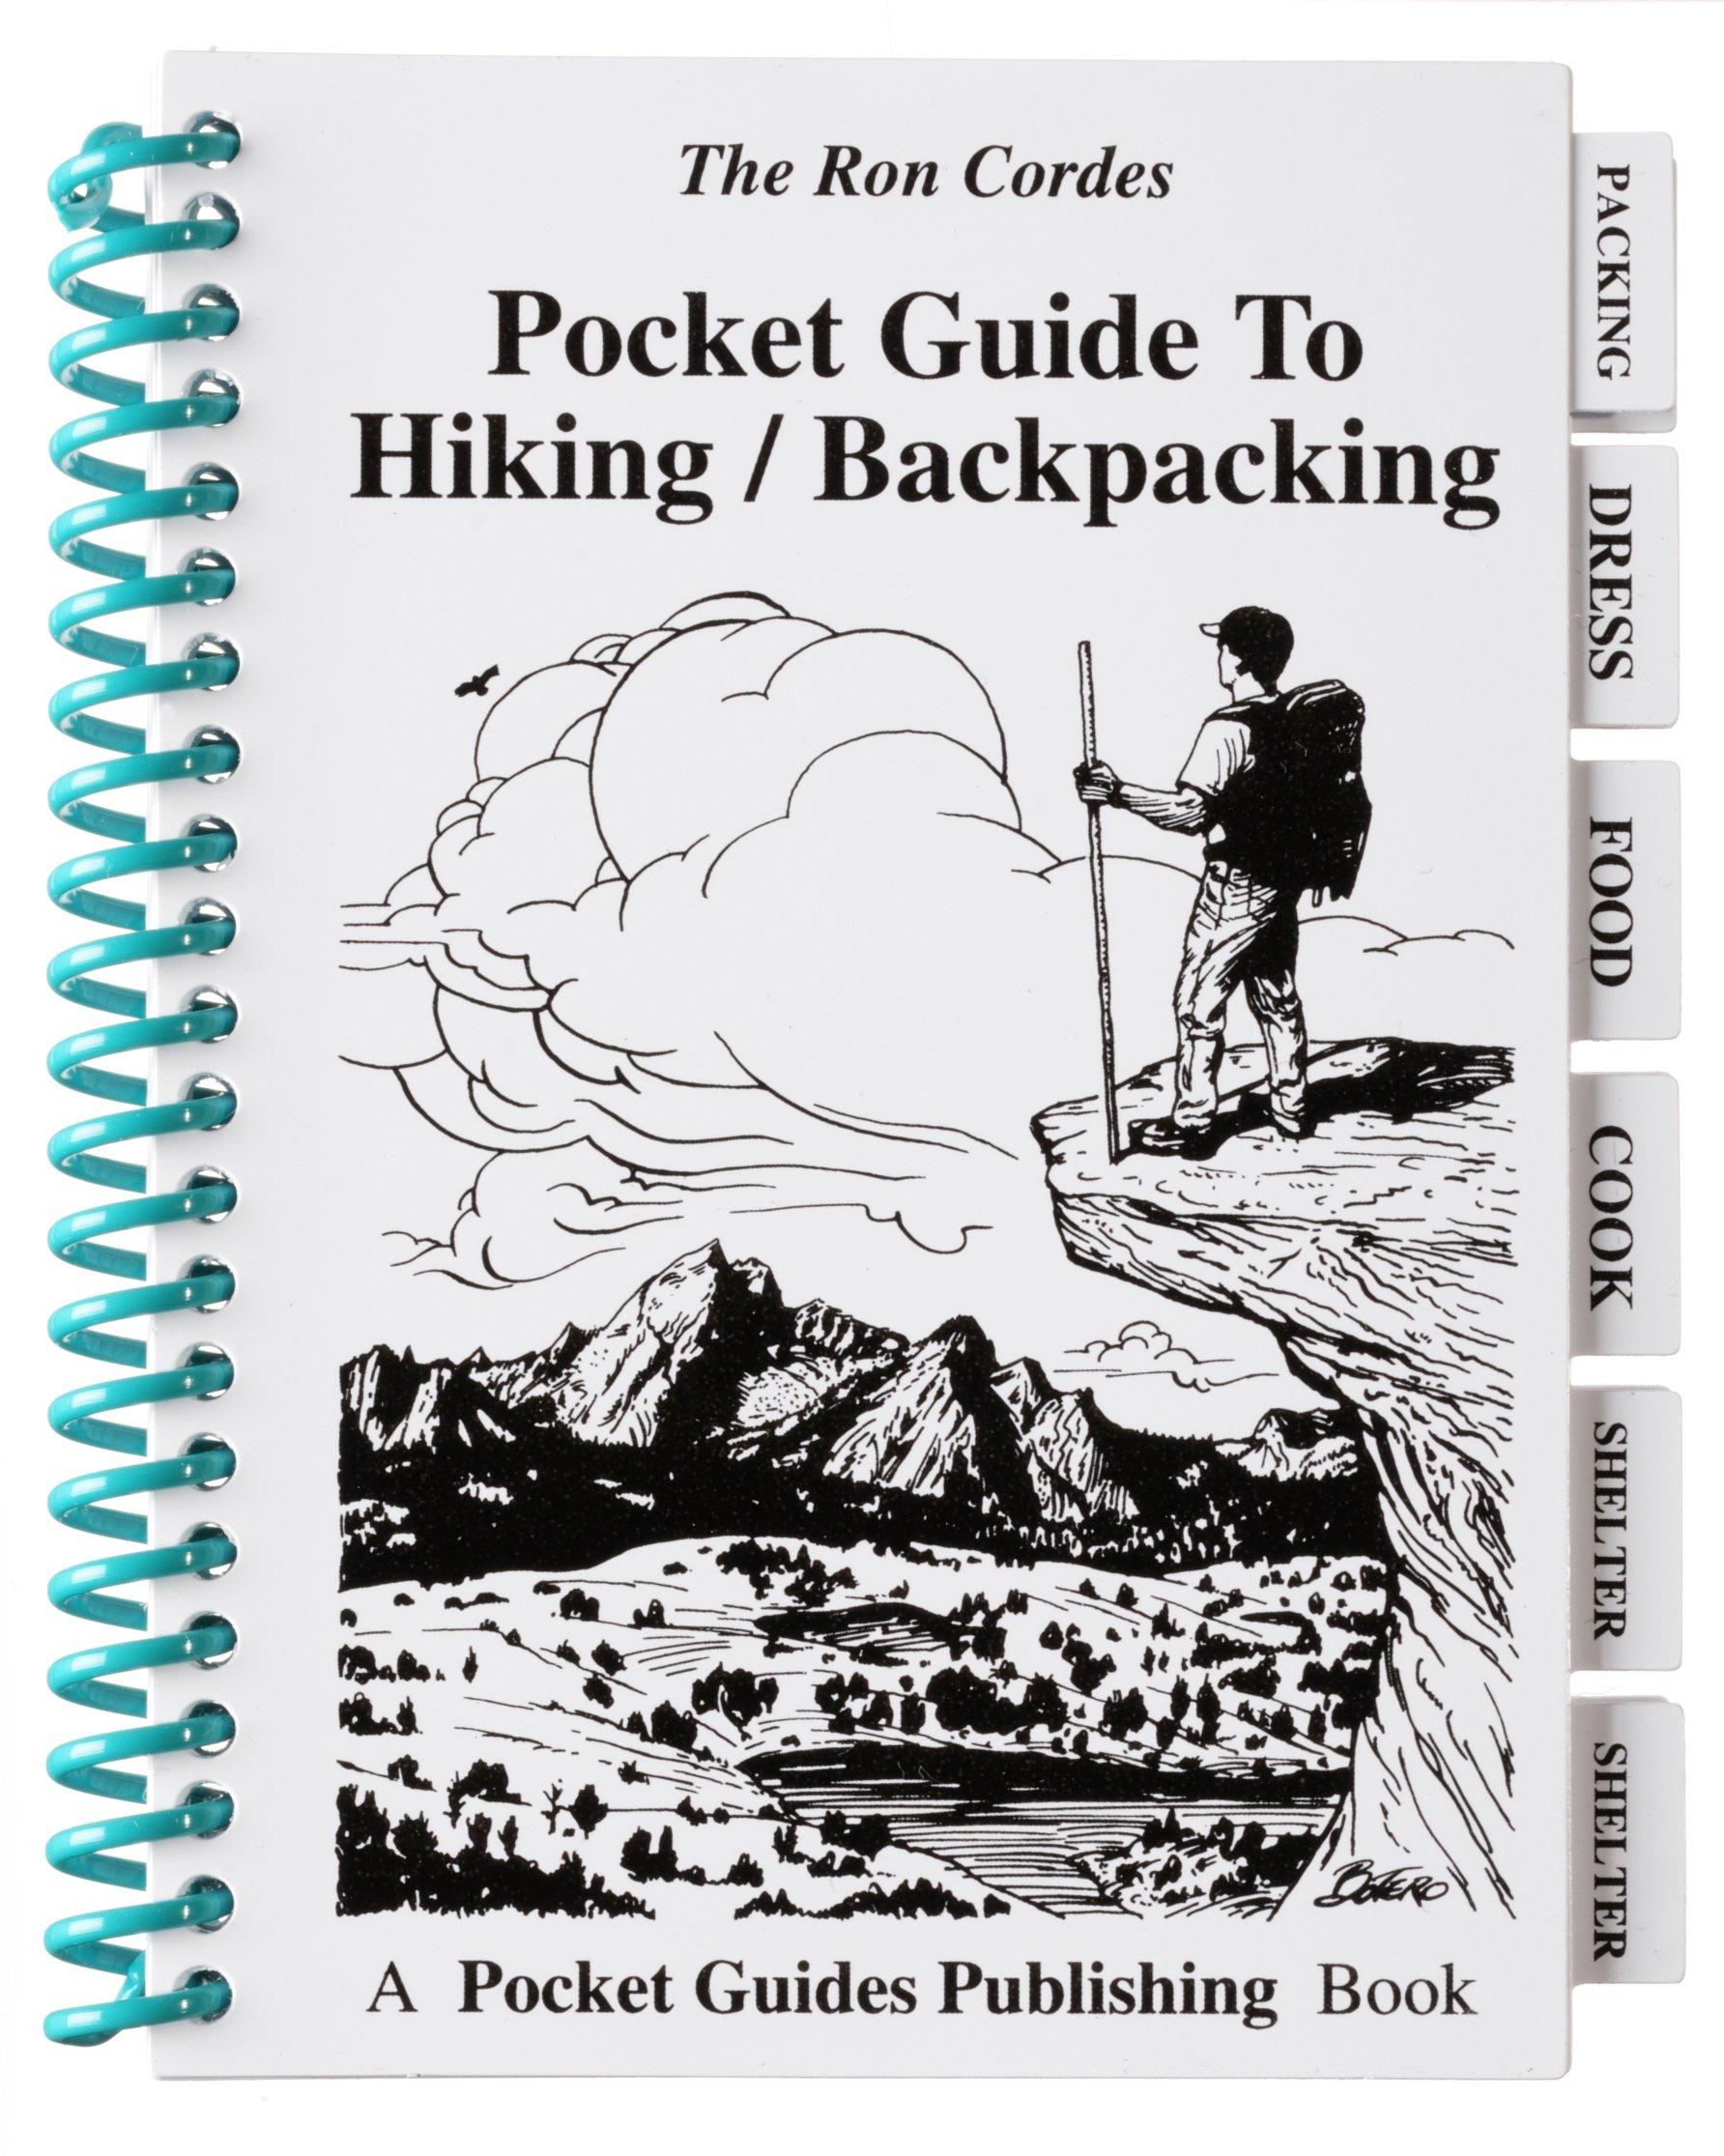 Pocket Guides - Hiking and Backpacking - Camping - Guide to Hiking and Backpacking - Trail Hiking - Ron Cordes